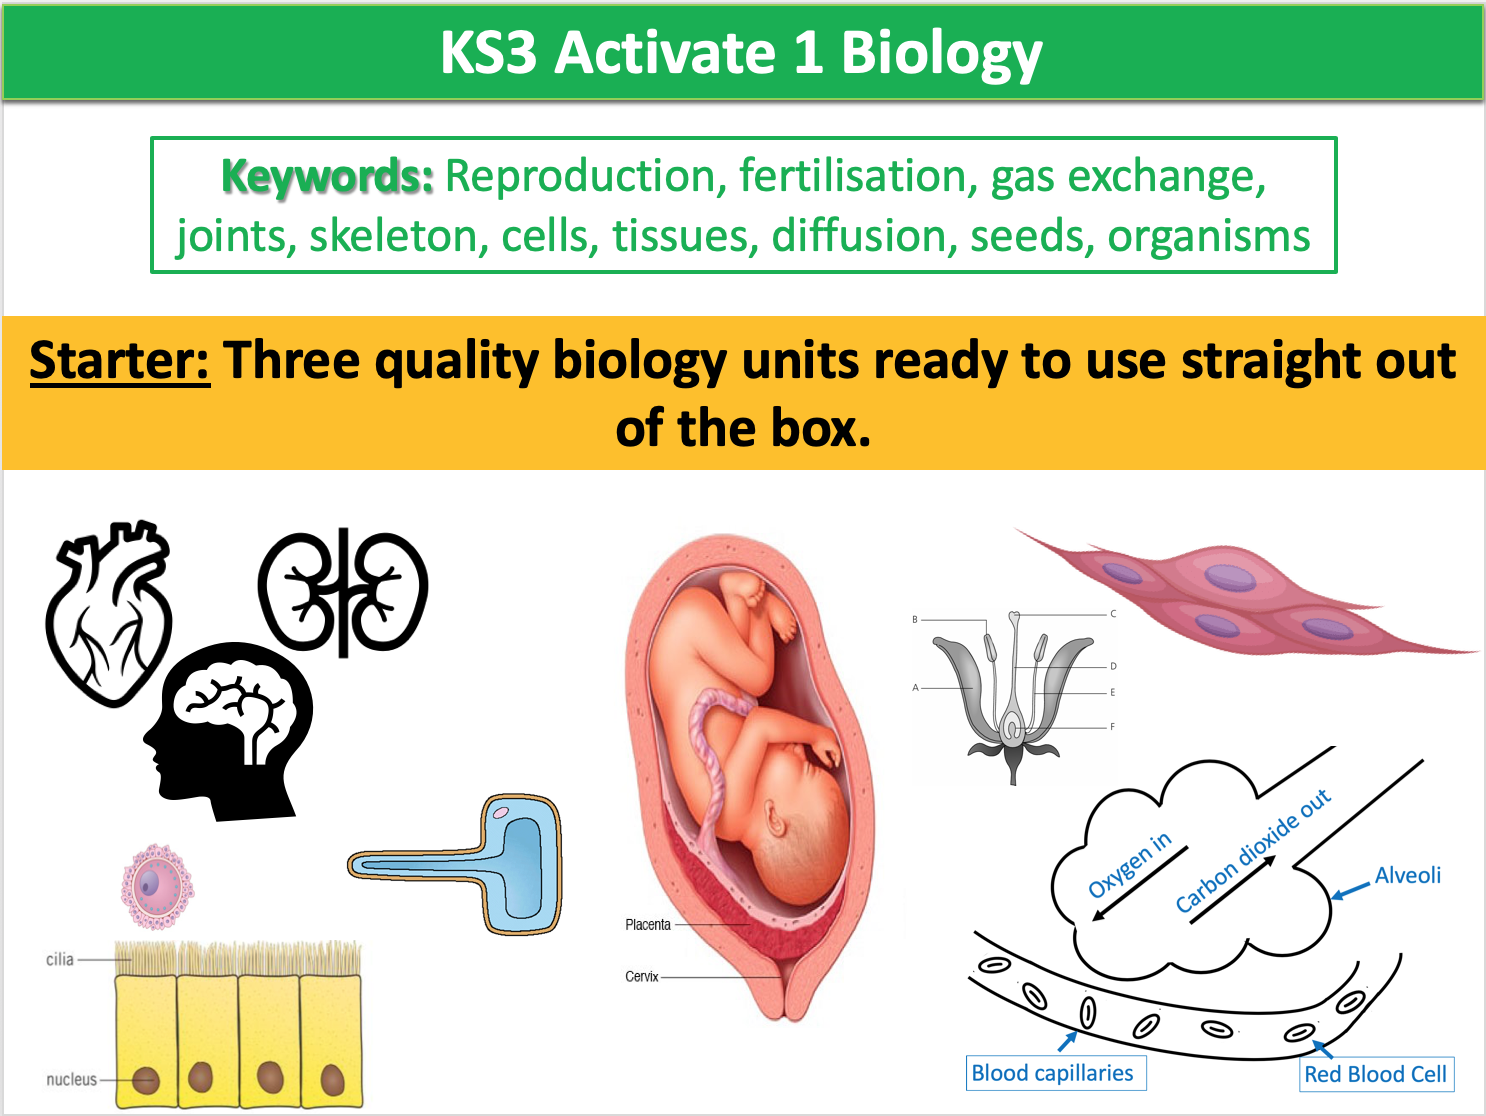 KS3 Activate 1 Biology